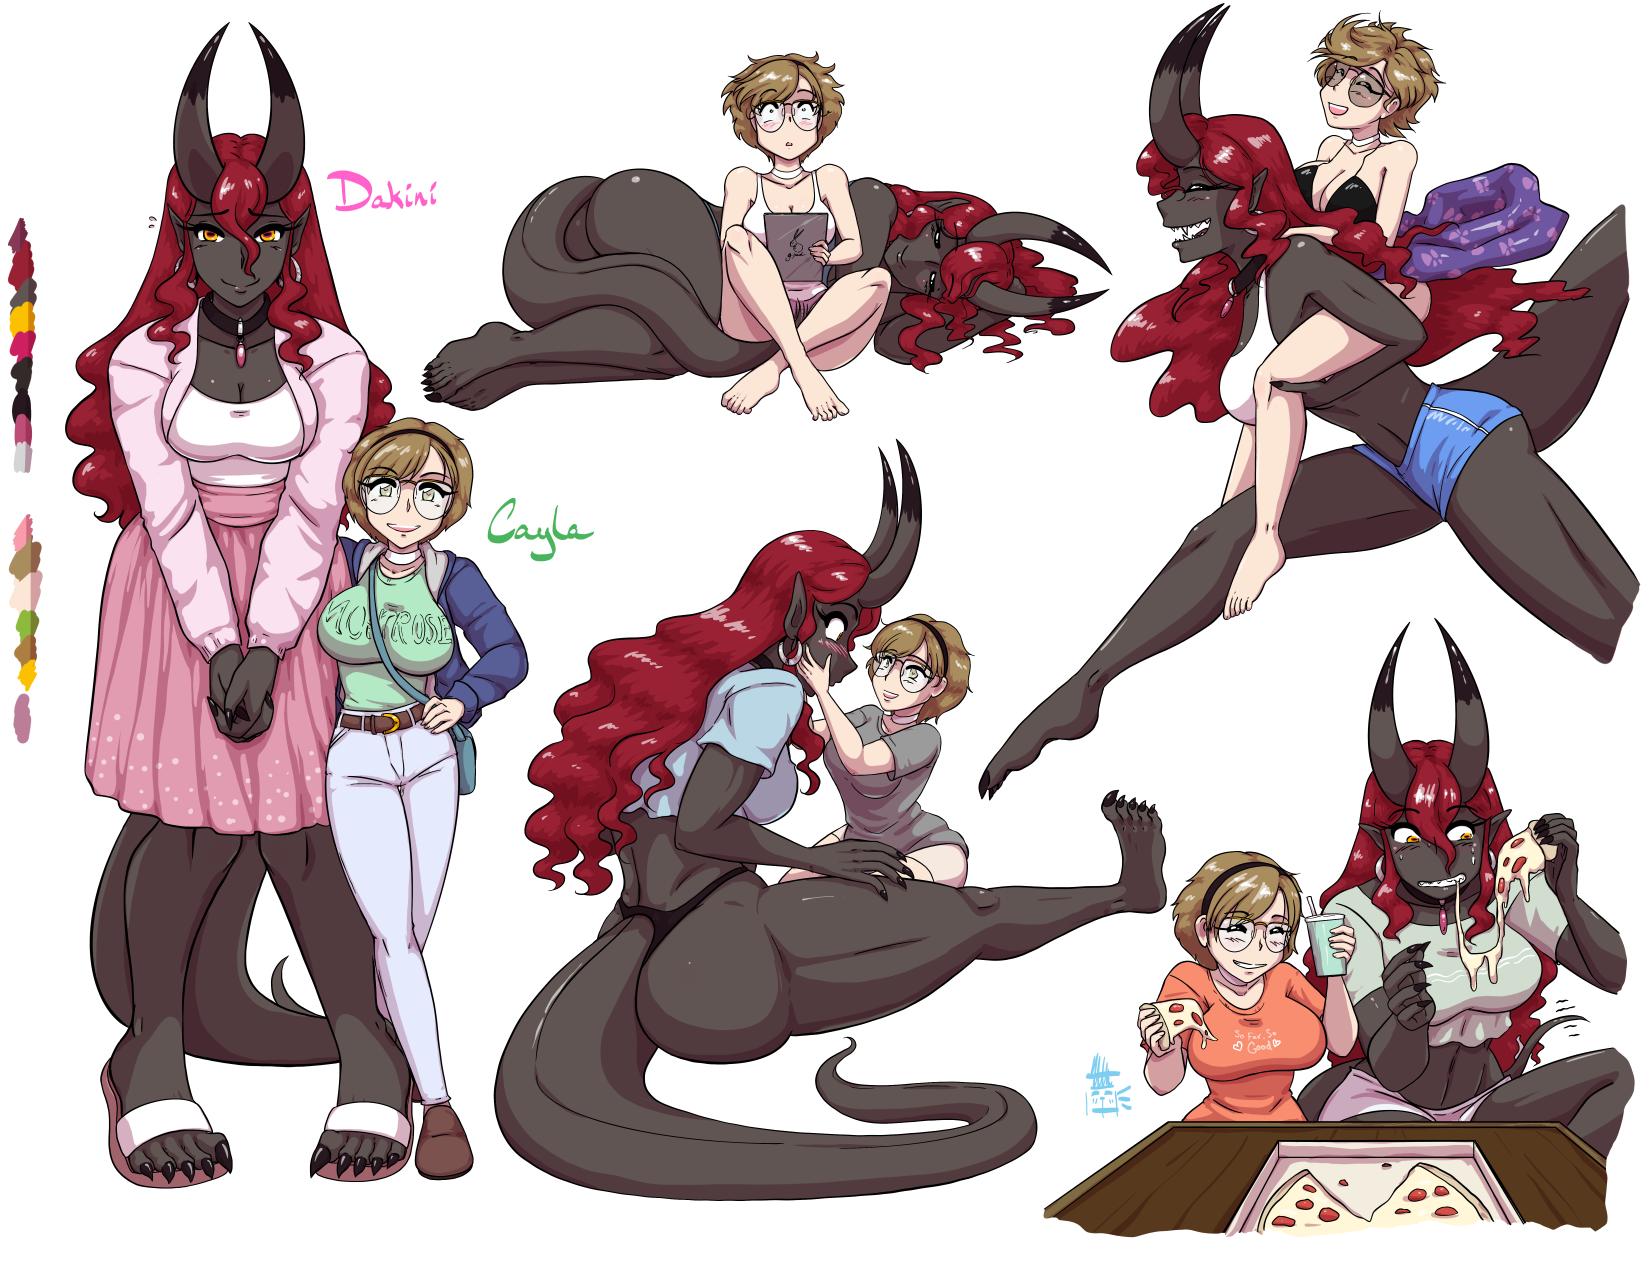 Dakini & Cayla: Character Sheet